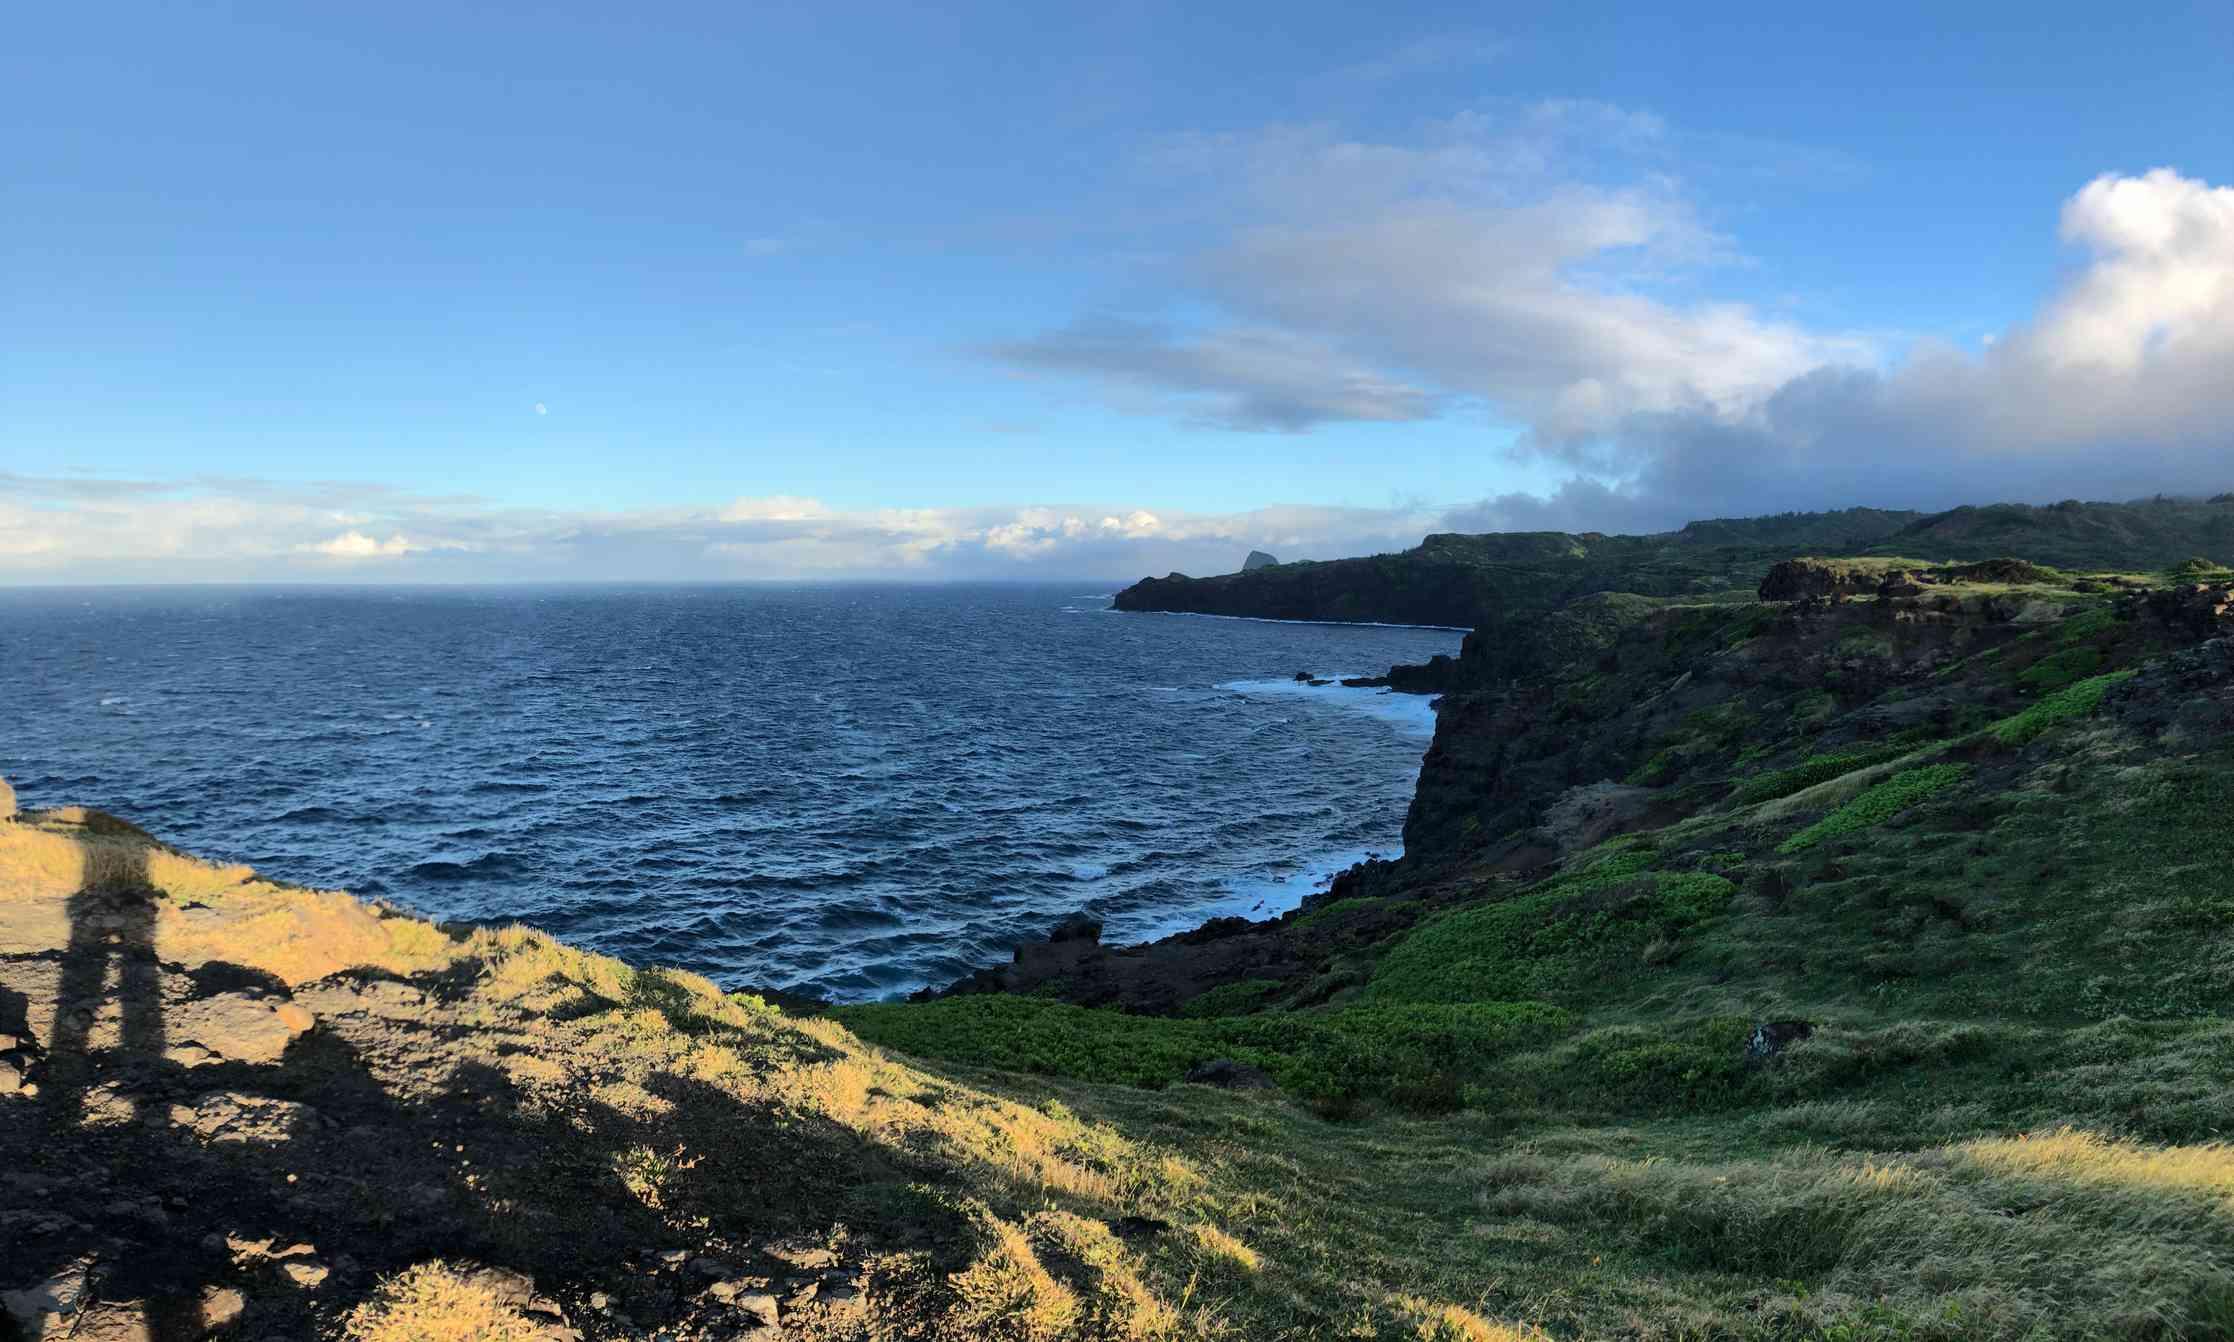 Ala Kahakai National Historic Trail